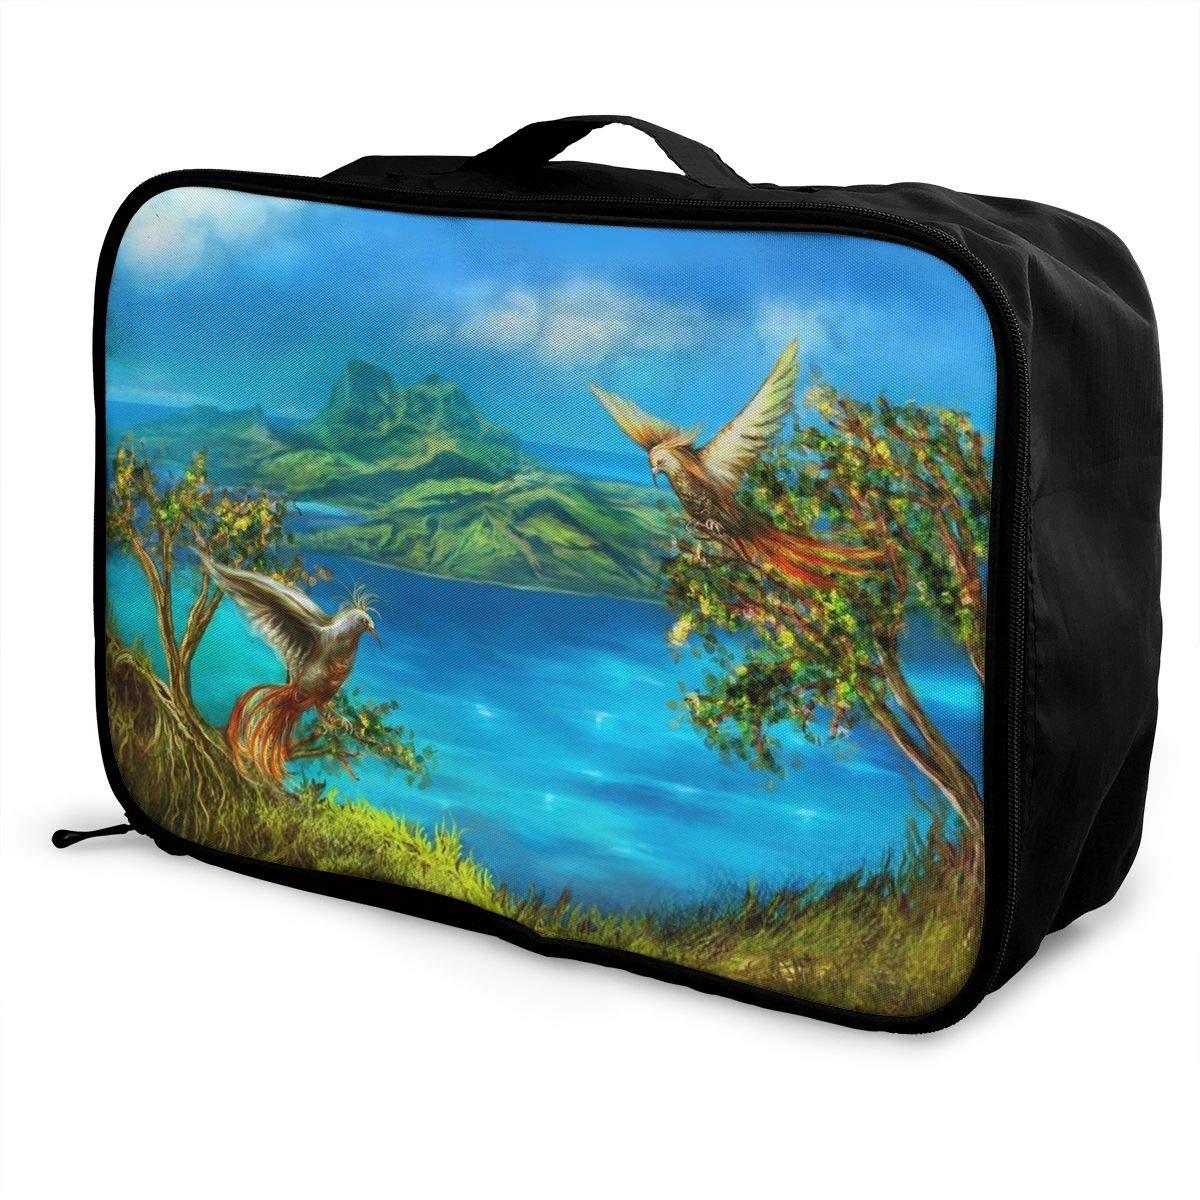 Travel Luggage Duffle Bag Lightweight Portable Handbag Fantasy Bird Pattern Large Capacity Waterproof Foldable Storage Tote